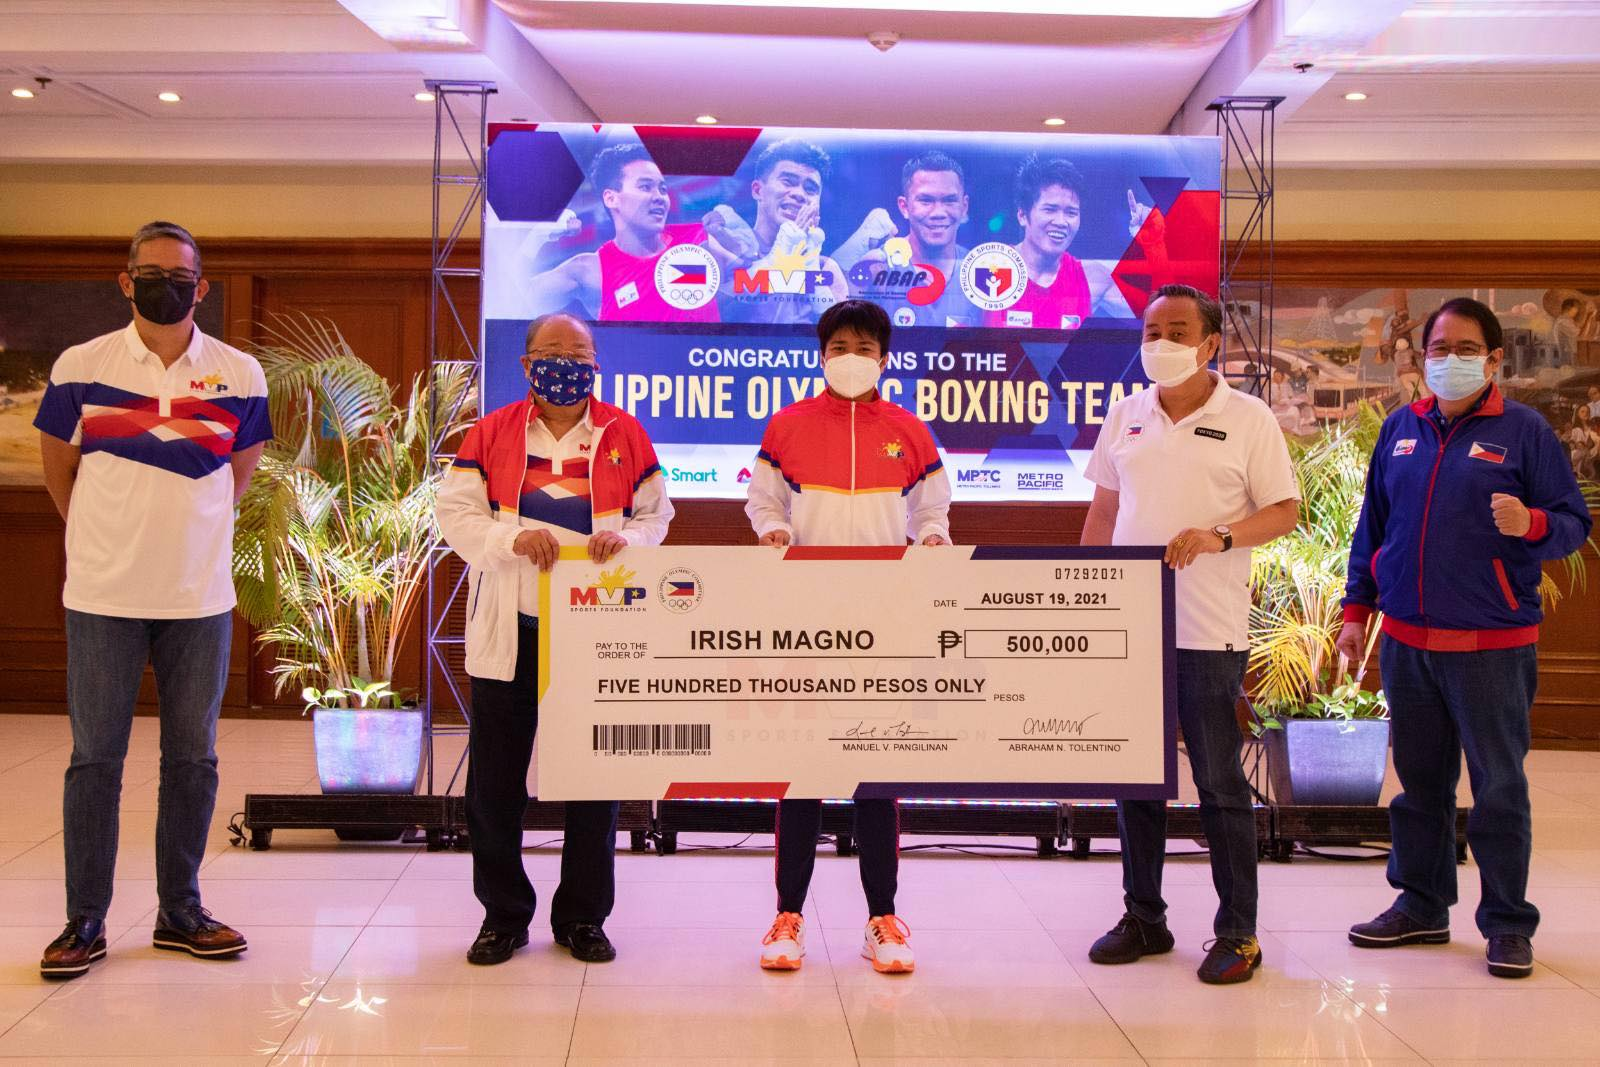 Tokyo-2020-MVPSF-Irish-Magno MVPSF rewards ABAP boxers for historic Tokyo campaign 2020 Tokyo Olympics Boxing News  - philippine sports news